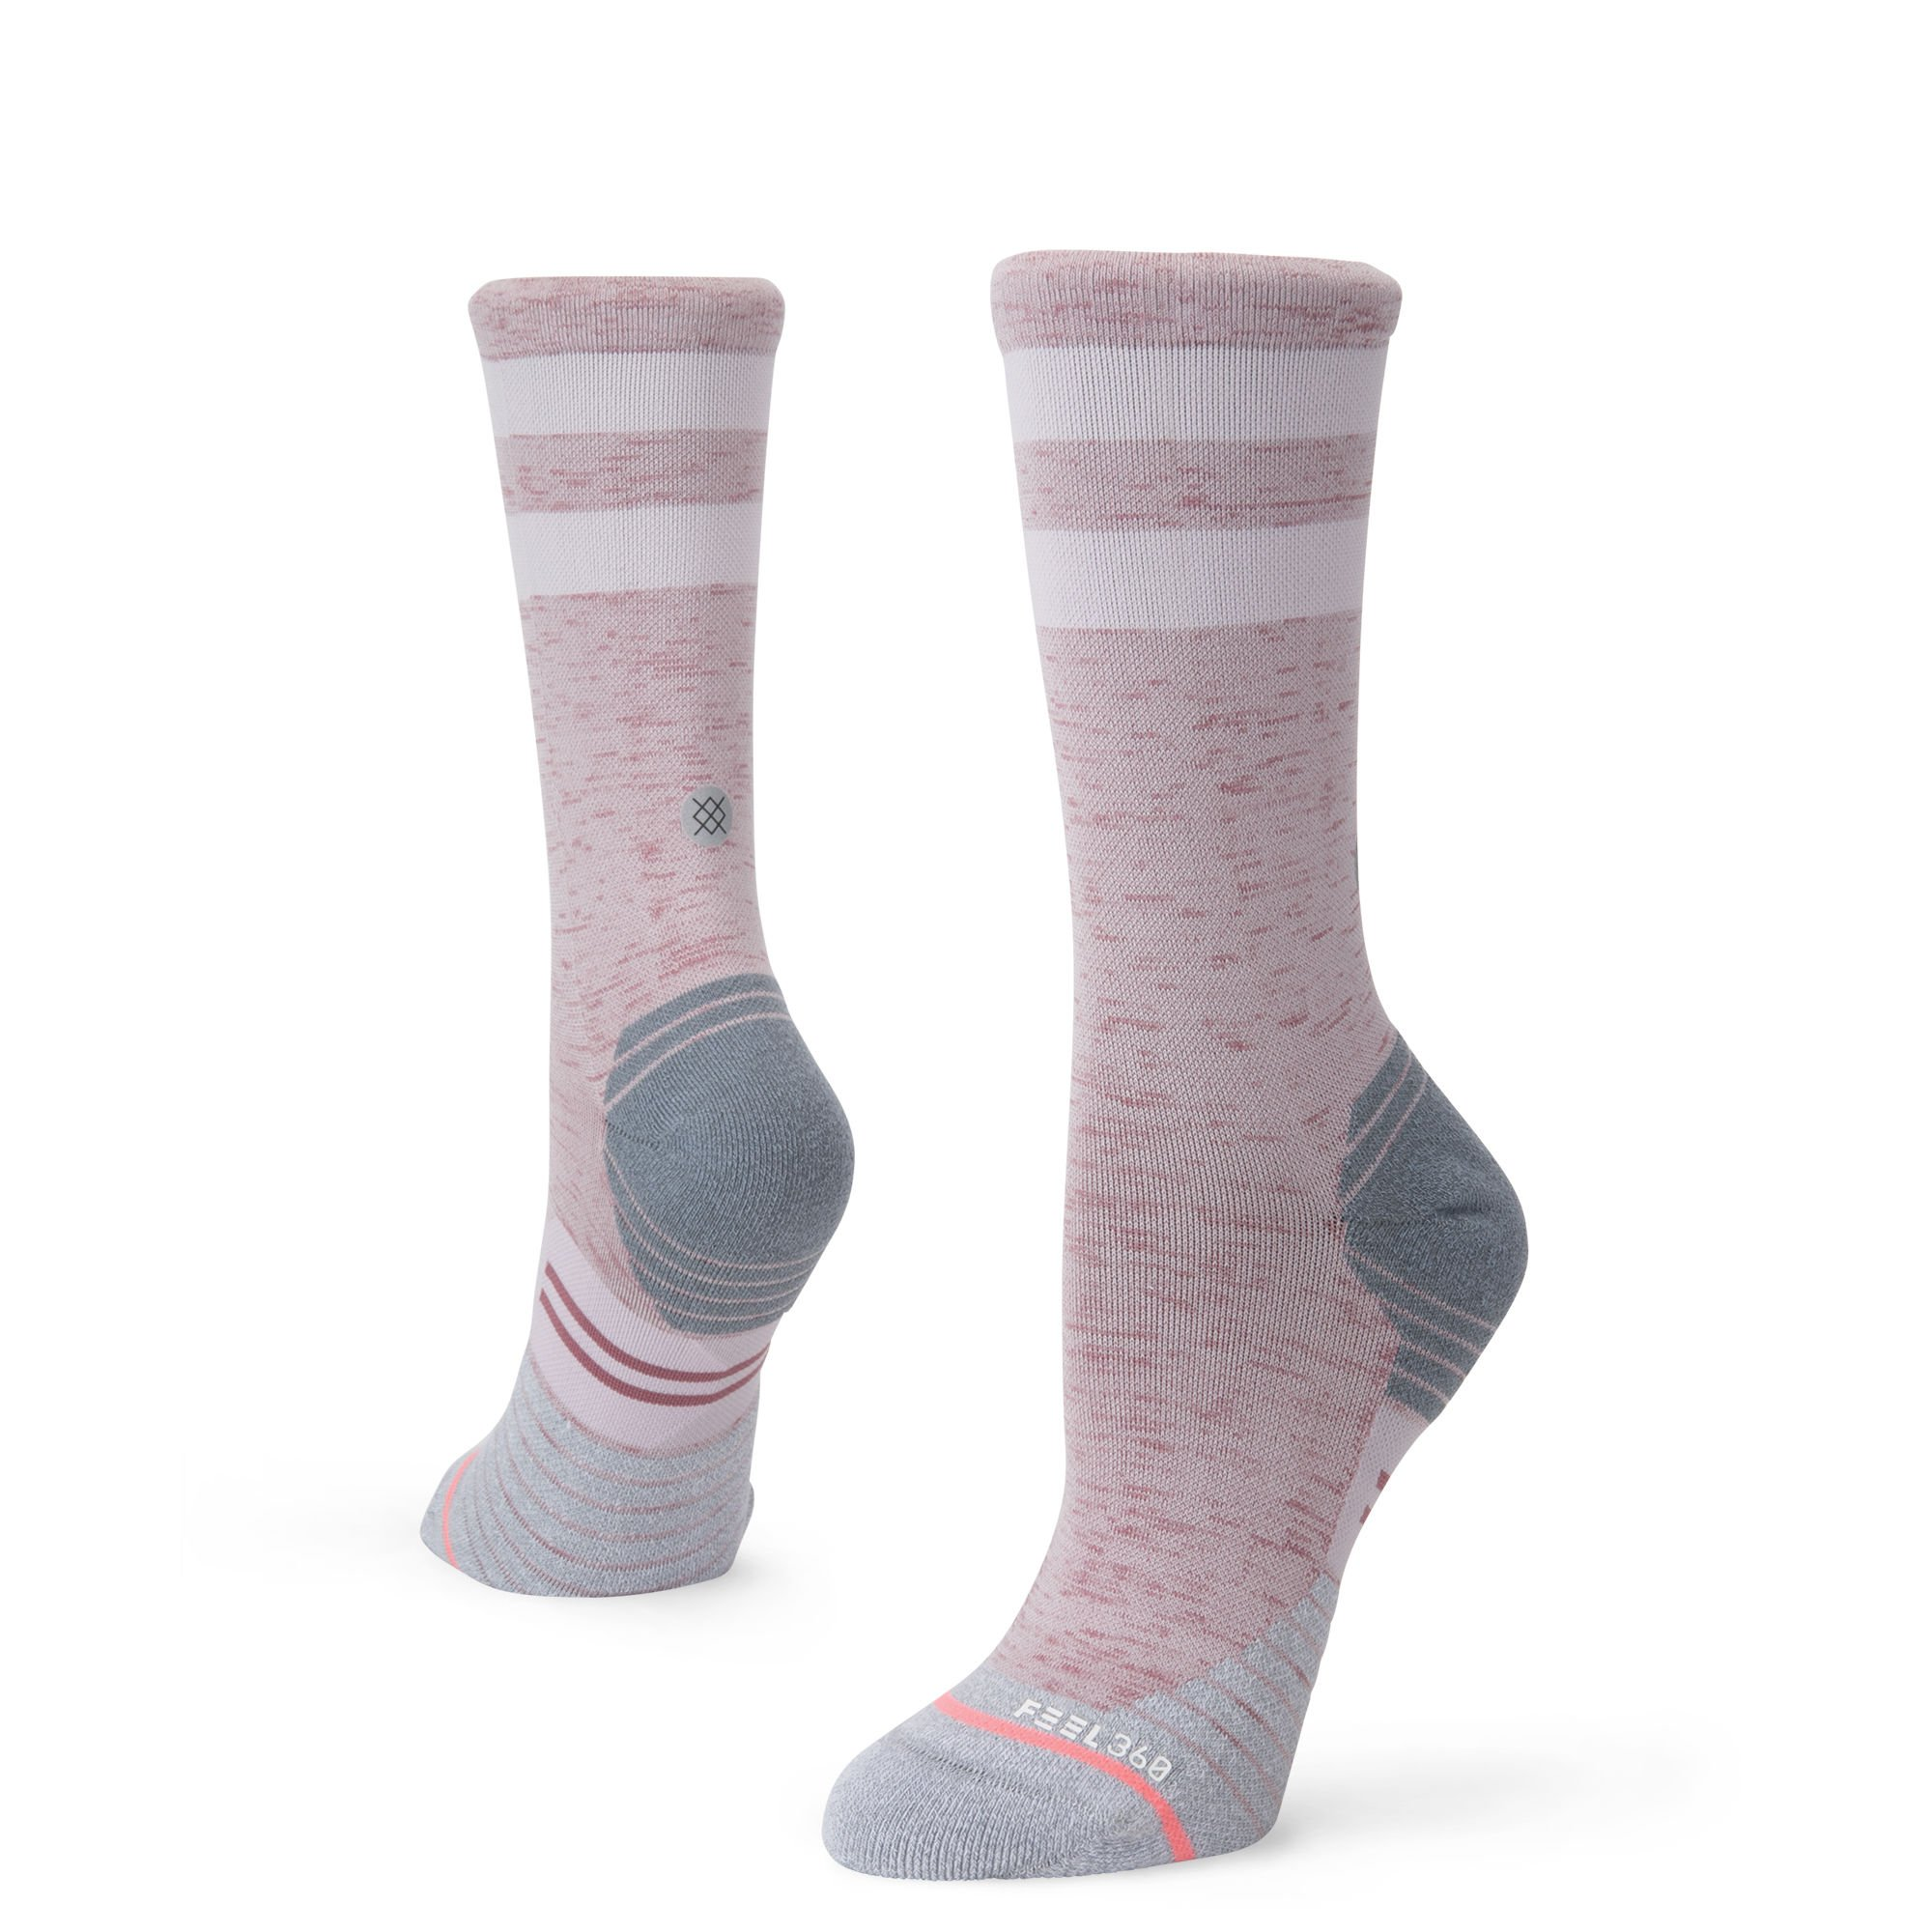 Stance Distance Crew Sock - Women's Grey Medium